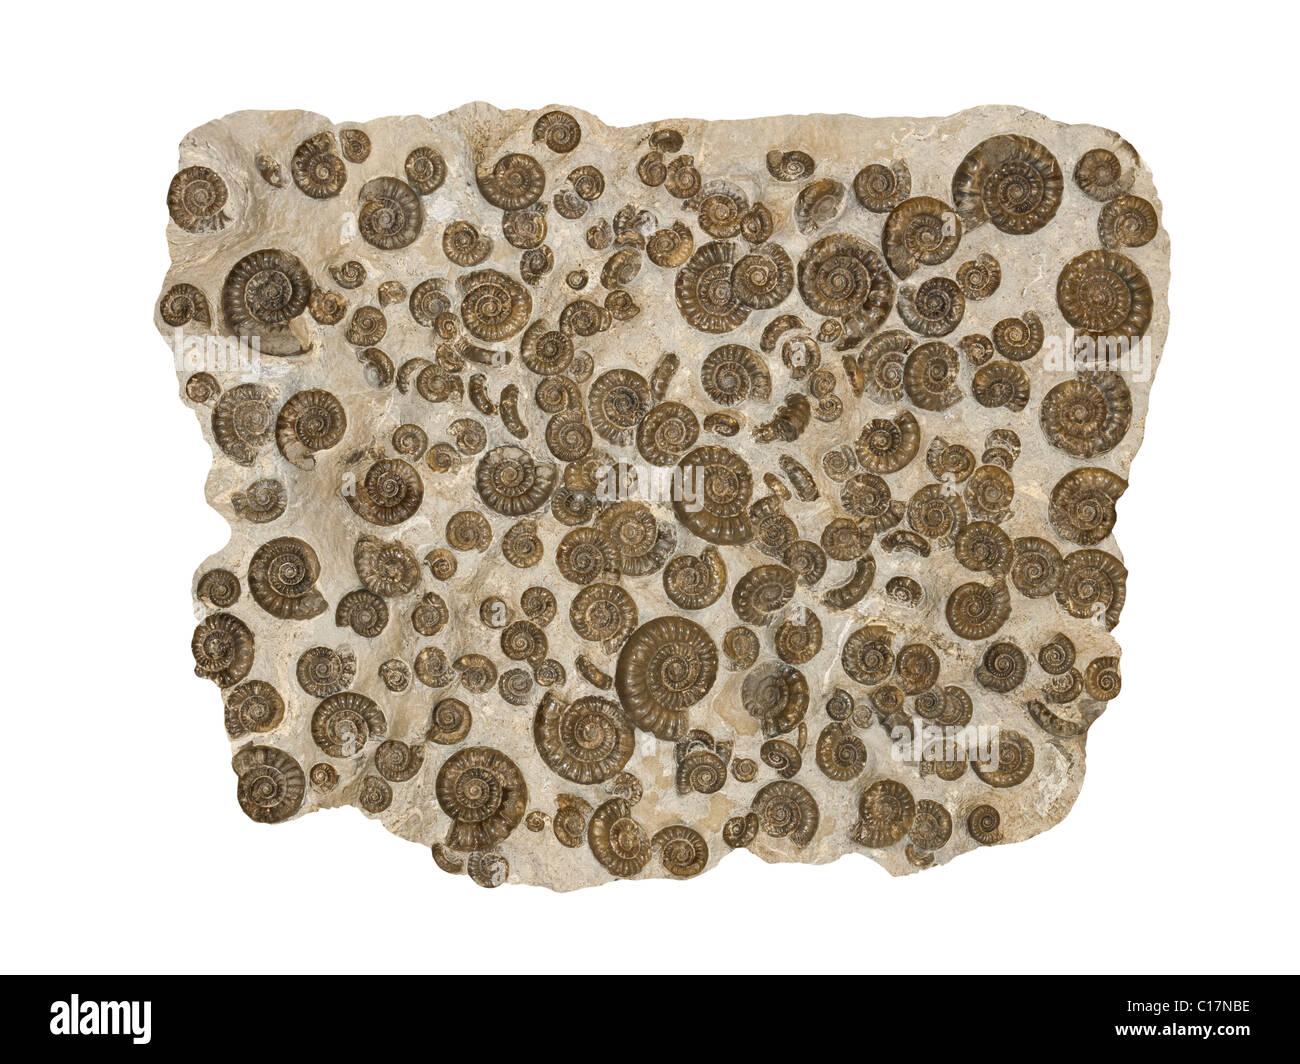 Fossil Ammonites Arnioceras kridioides from Jurassic period Yorkshire Coast UK - Stock Image